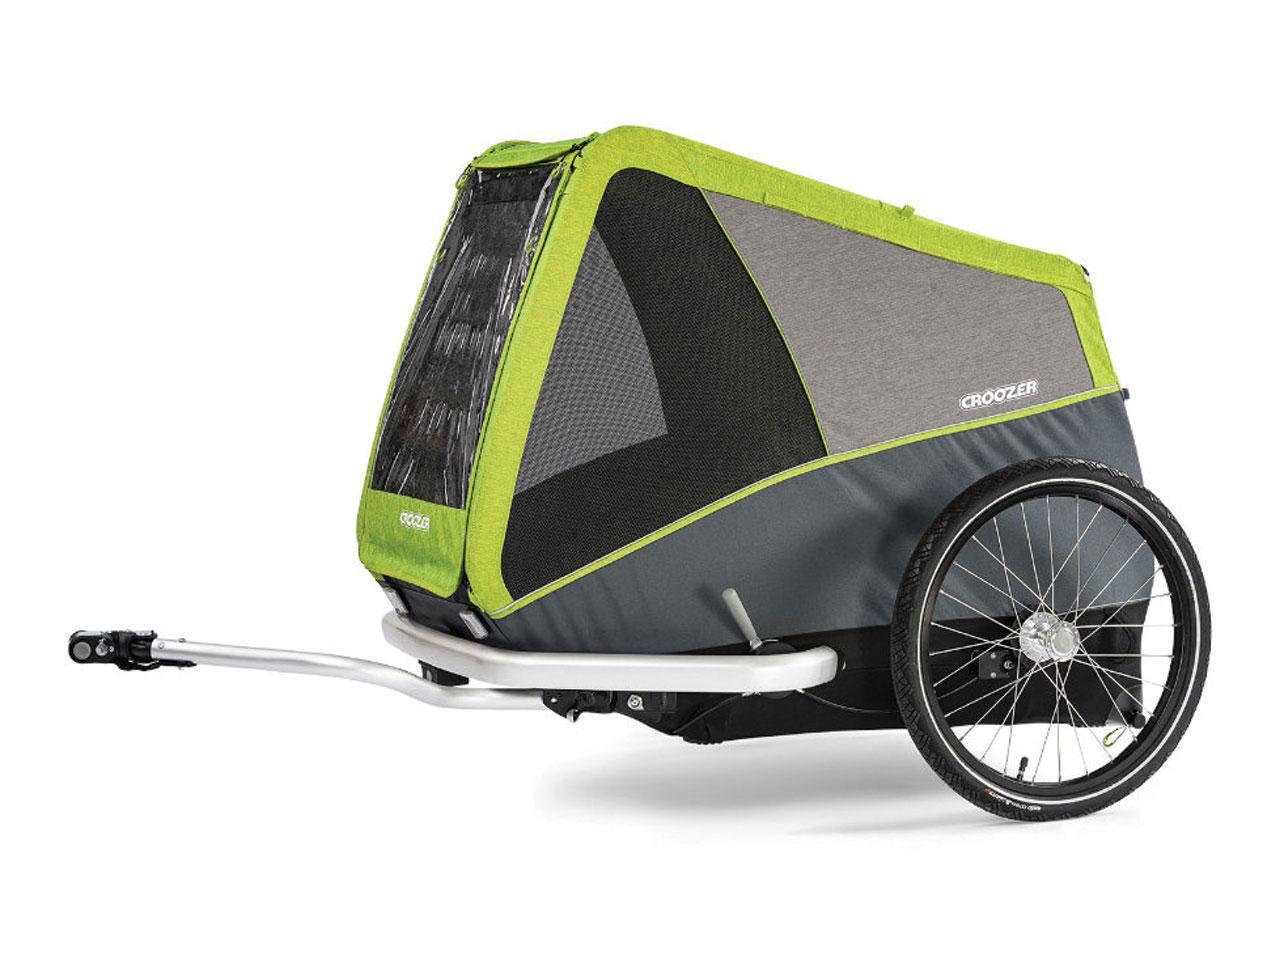 CROOZER Dog XL Grasshopper 2018, green